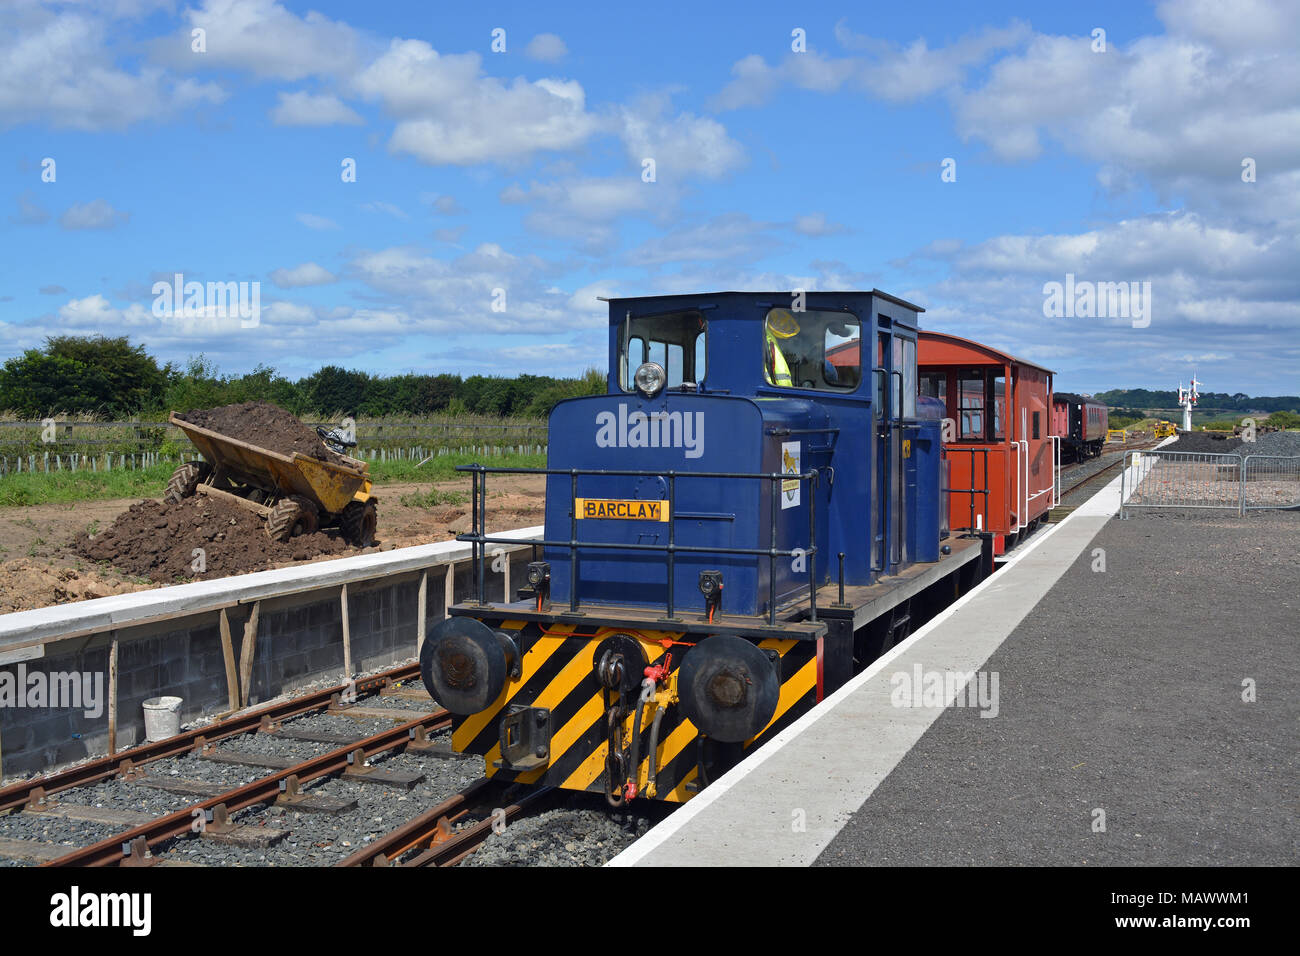 NCB Barclay 615 Diesel locomotive - Stock Image